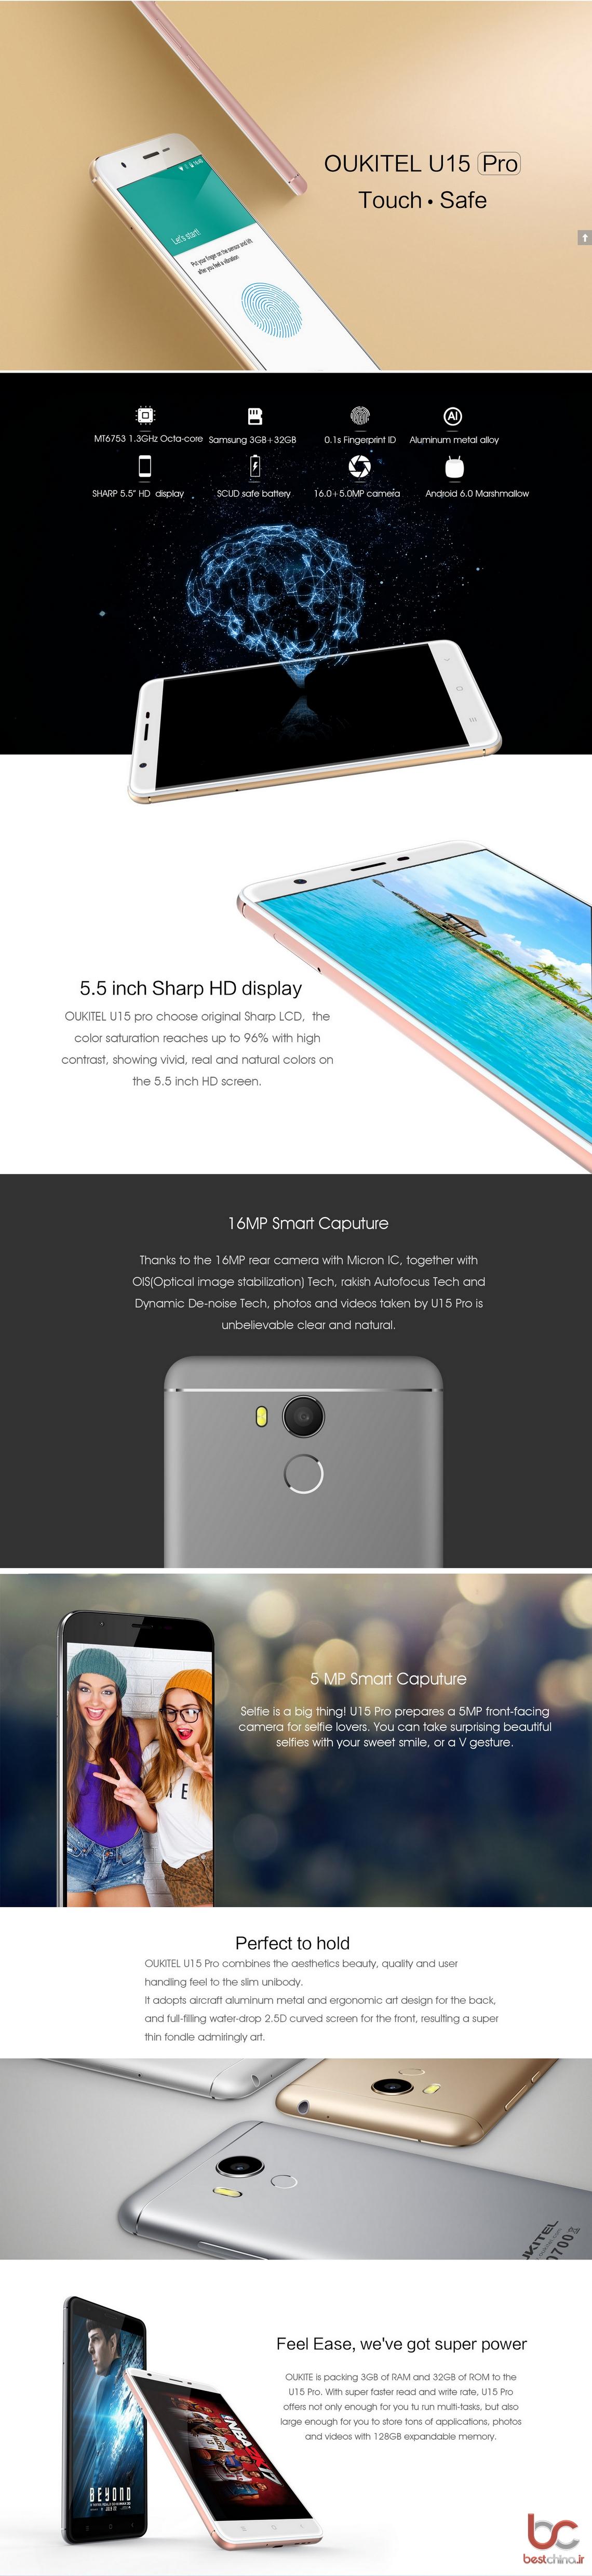 fireshot-screen-capture-707-oukitel-smartphone-oukitel_com_products_u_u15-pro-55_html